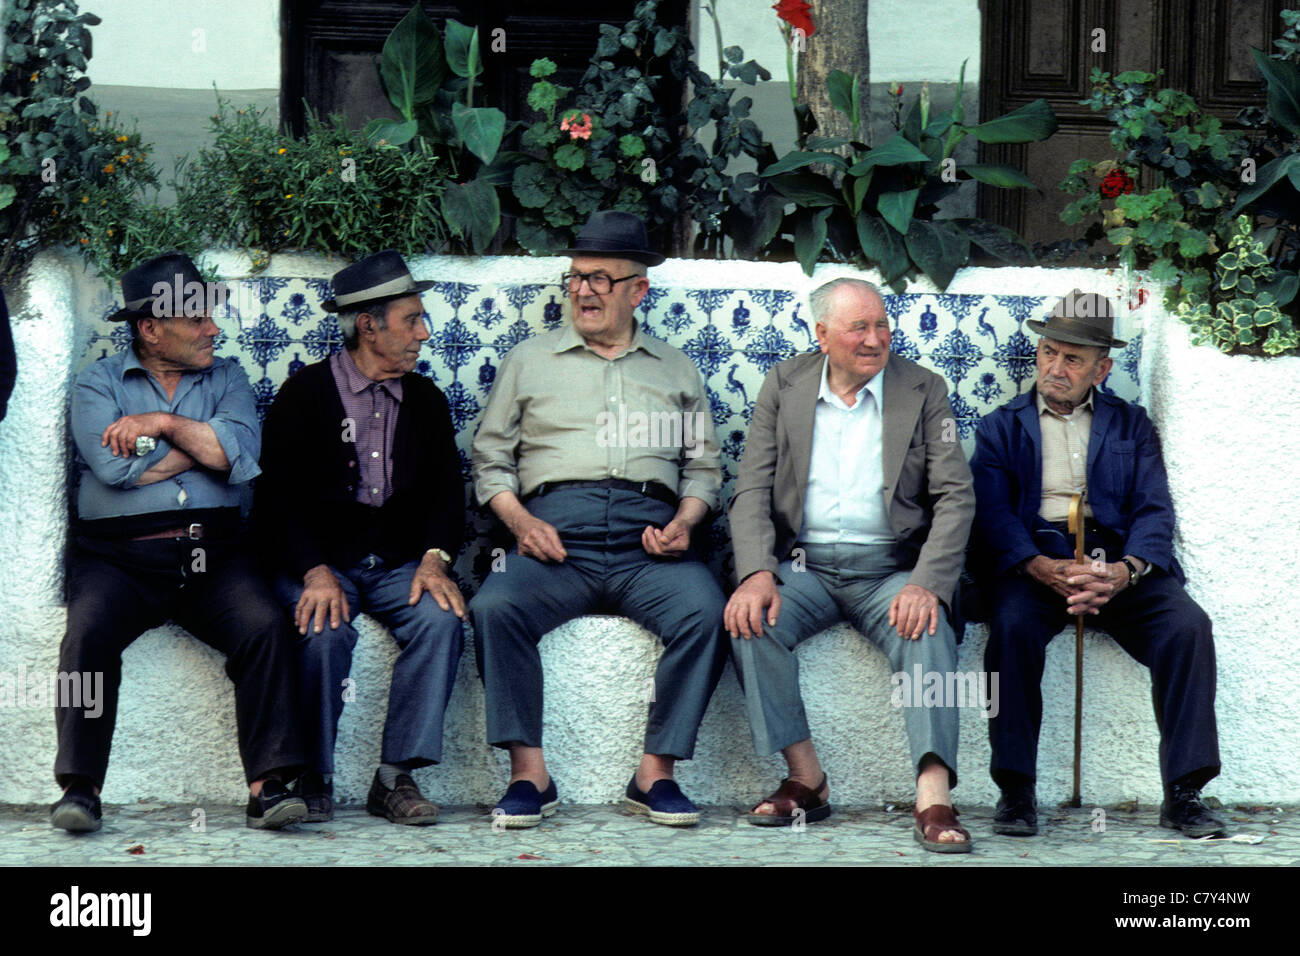 Old men chatting